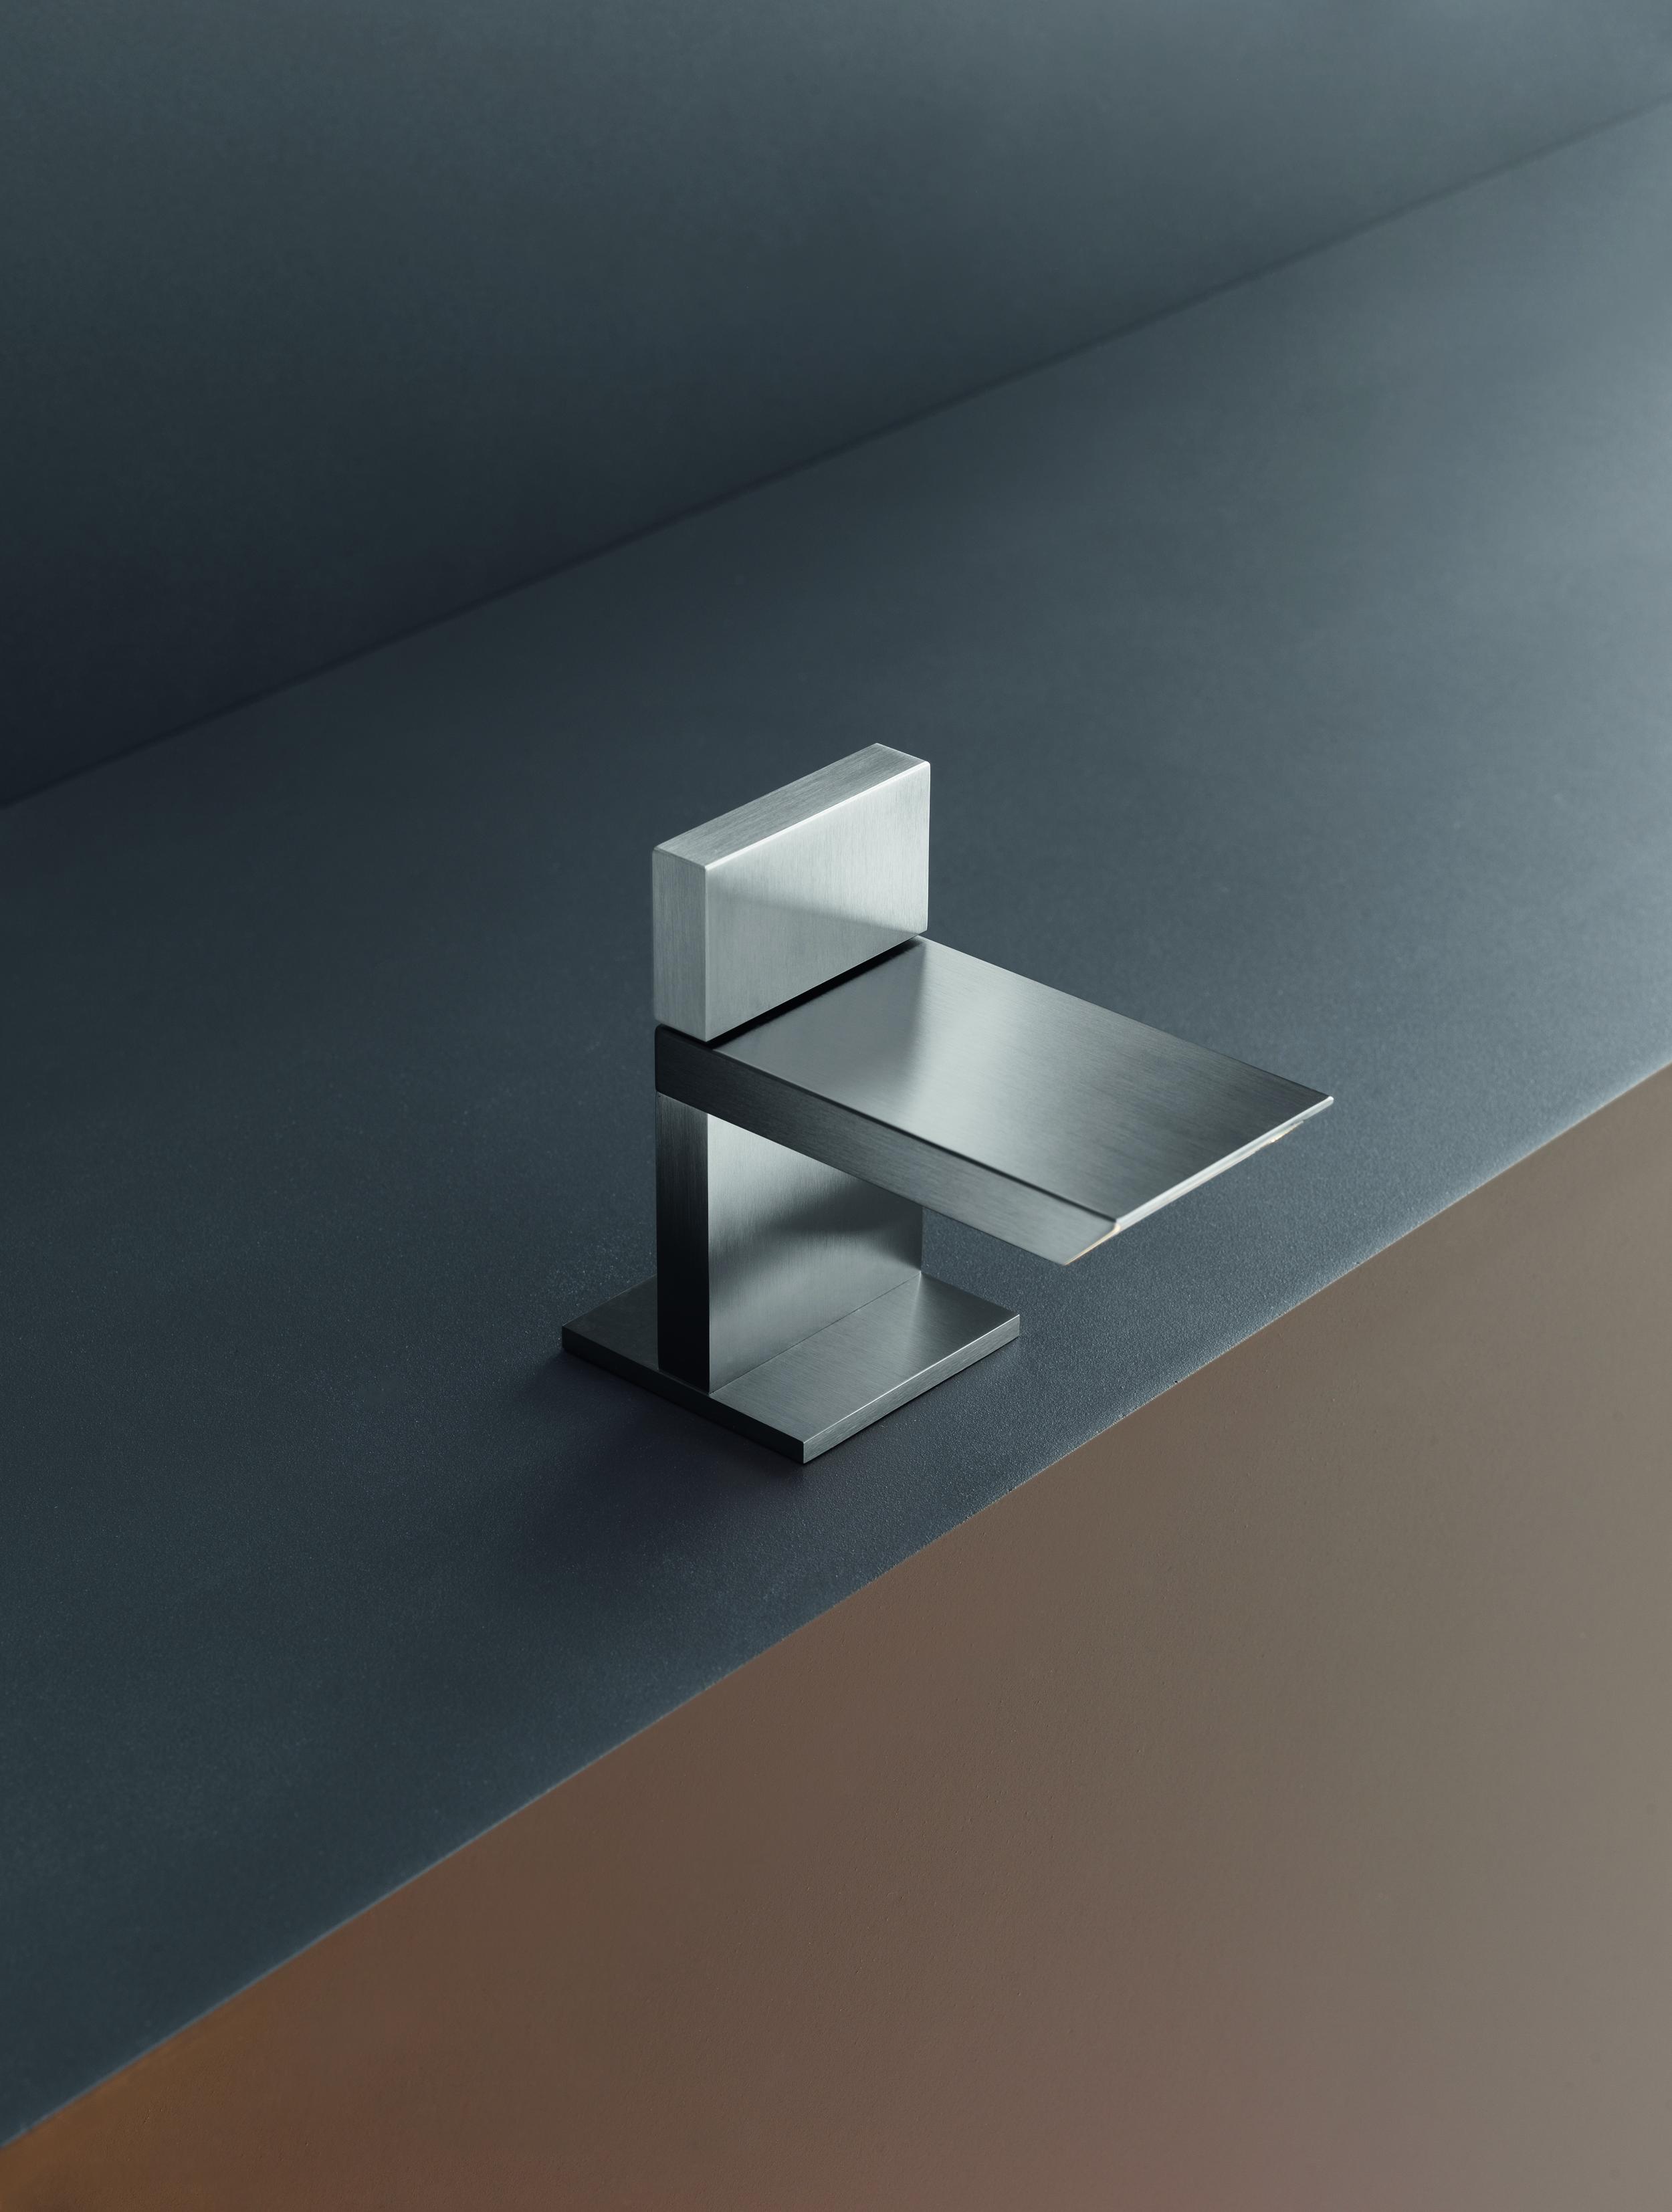 Contemporary Bar Deck Mount Faucet